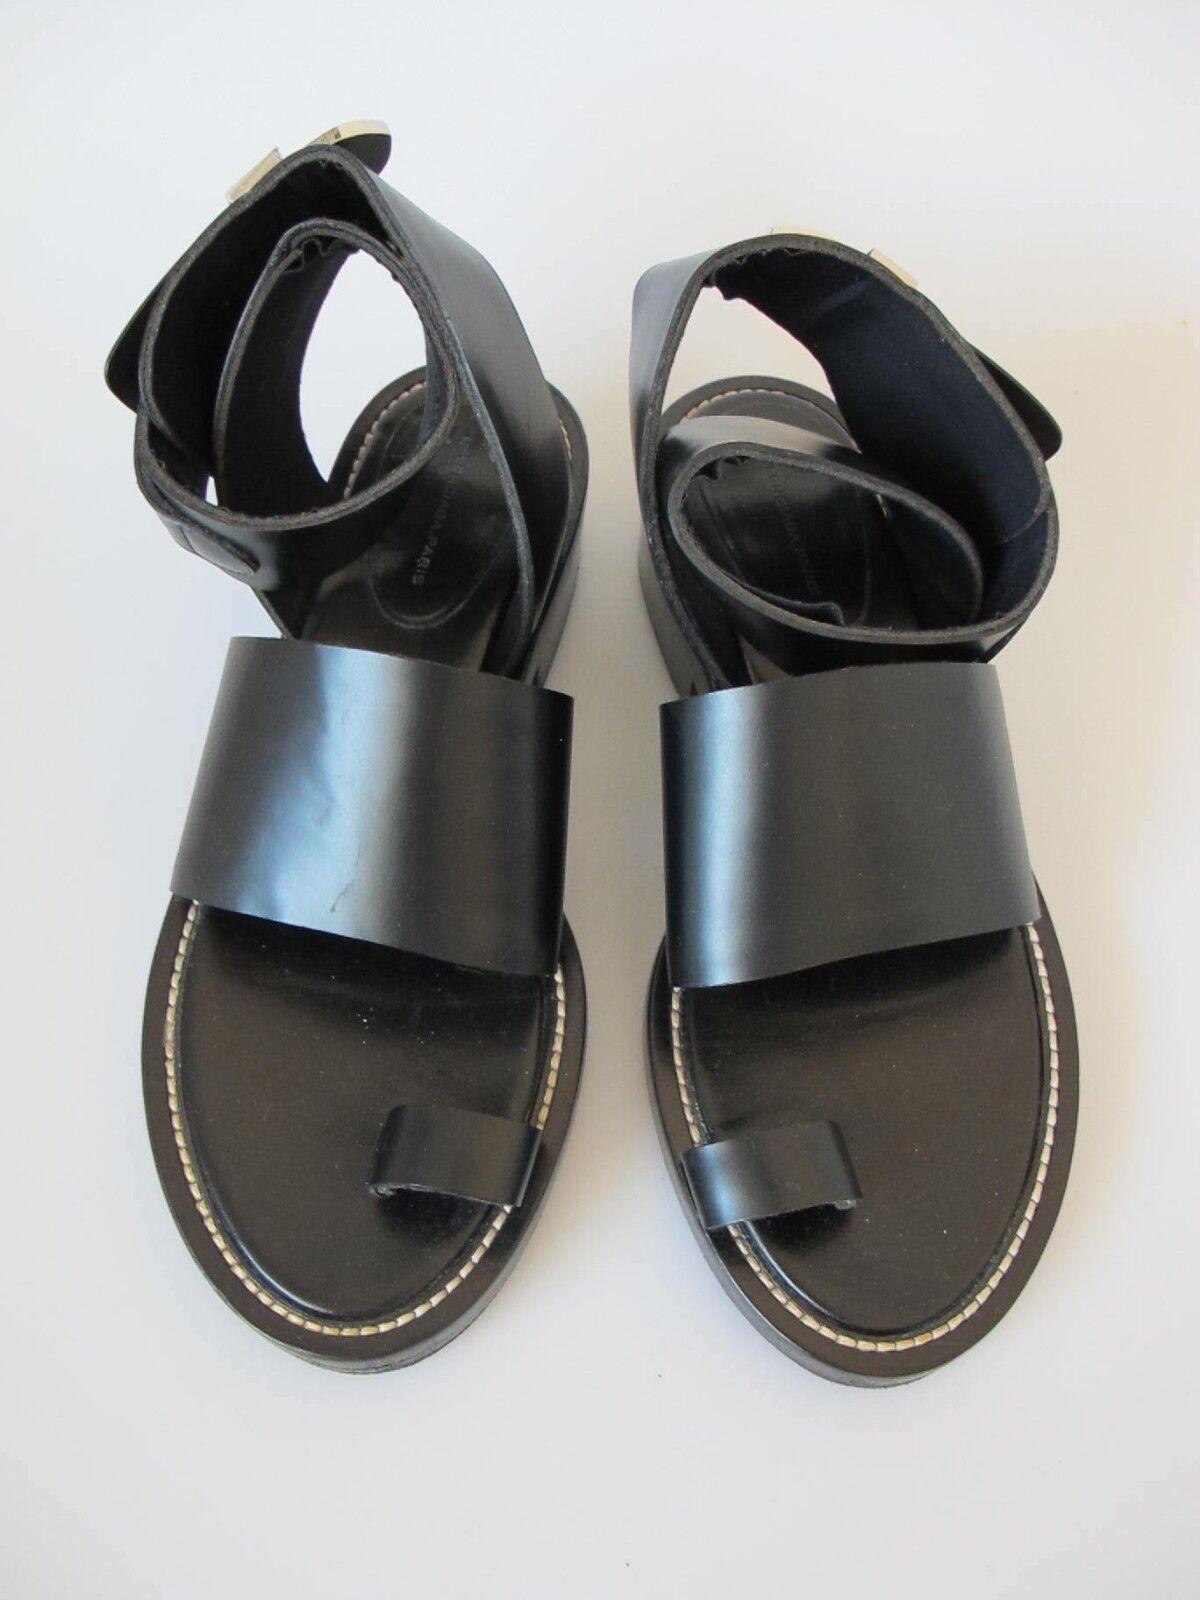 BALENCIAGA leather ghesquiere amazing sandals black leather BALENCIAGA sz.40 neoprene lining doc st af89f8